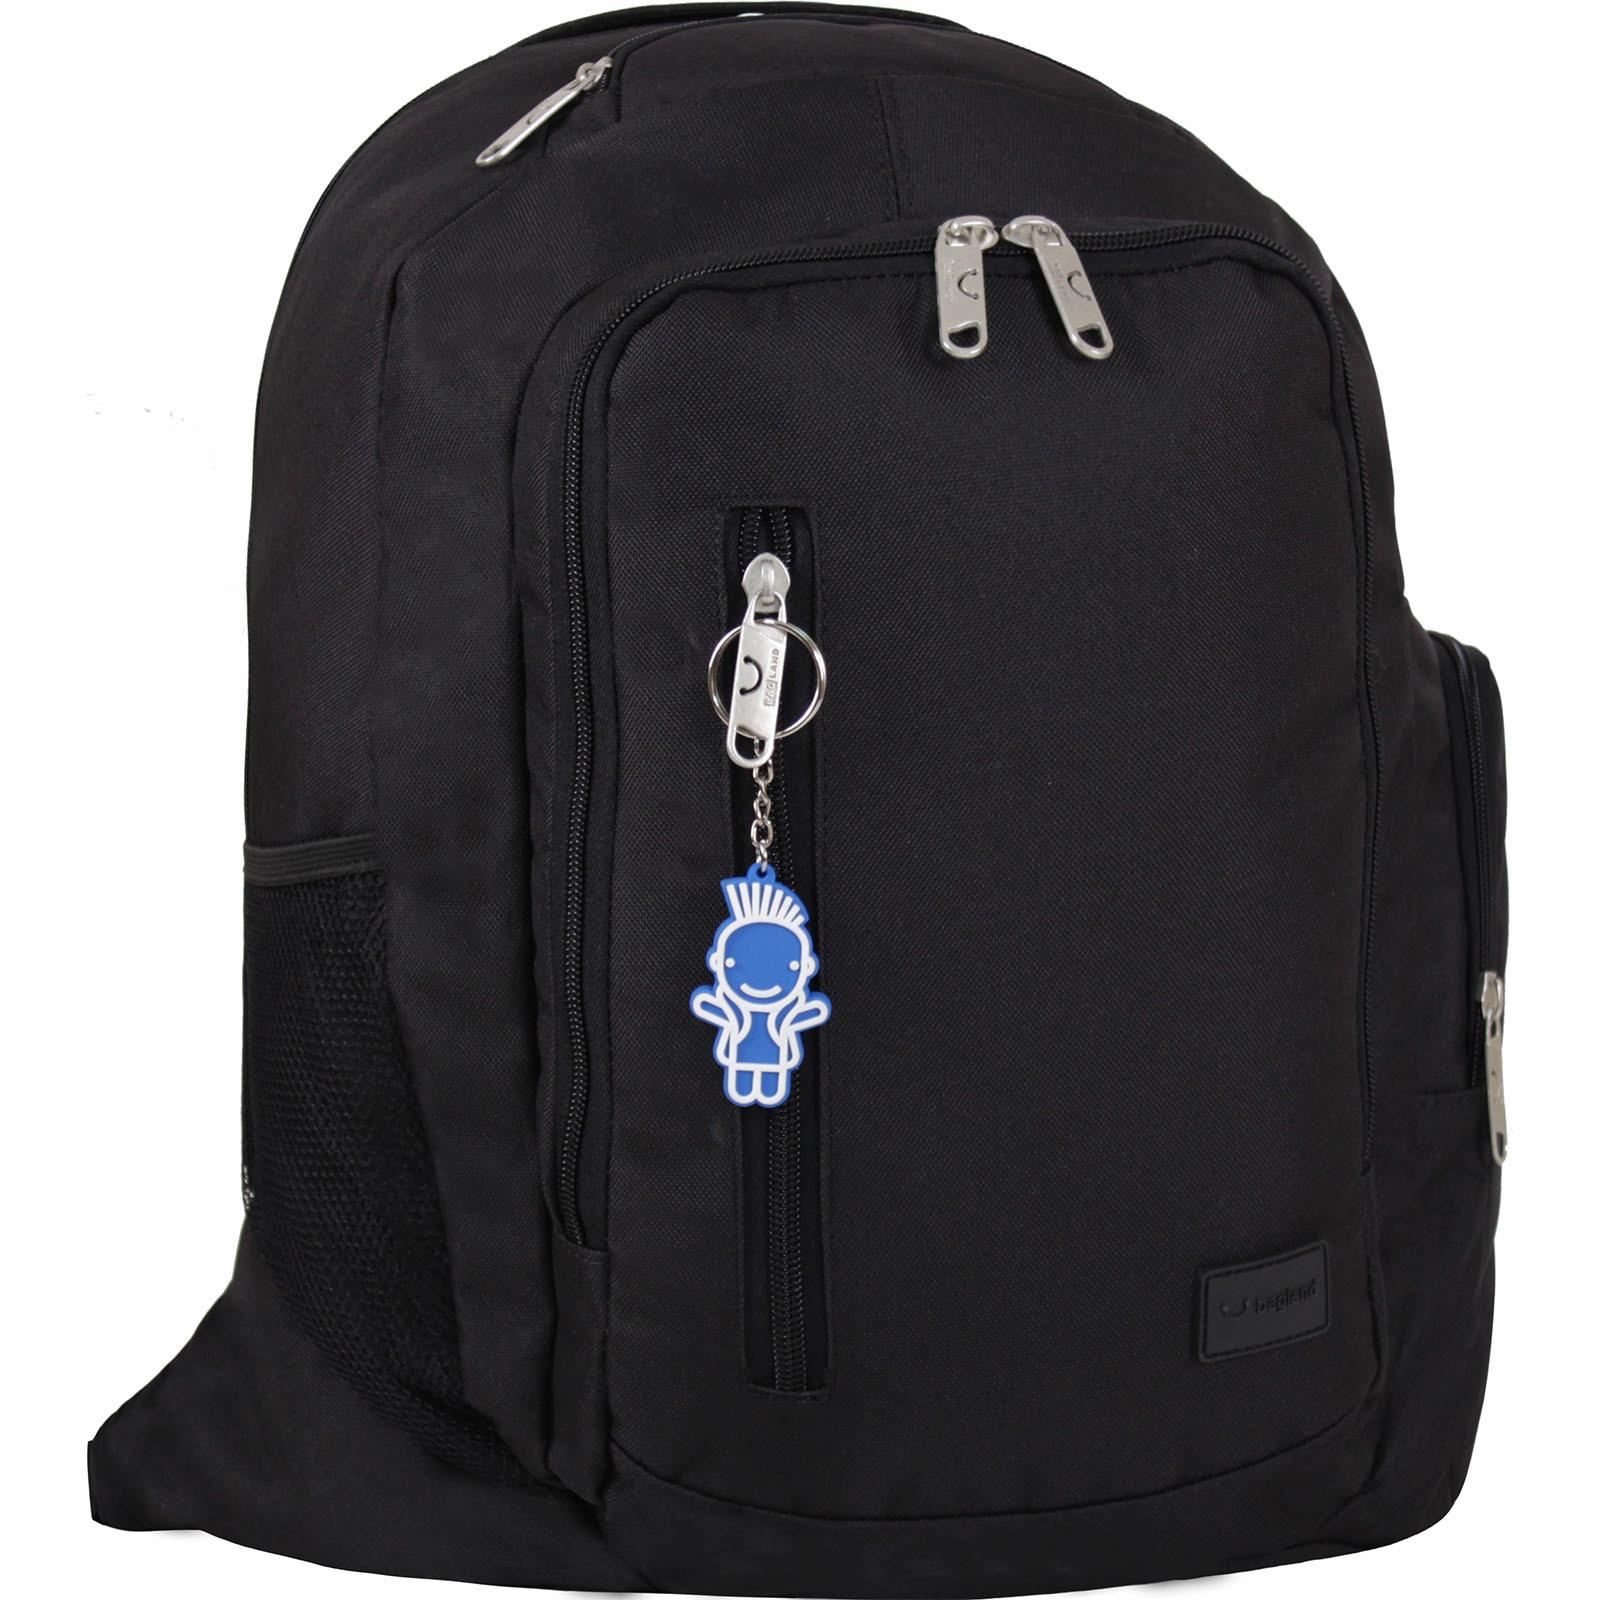 Рюкзаки для ноутбука Рюкзак для ноутбука Bagland Техас 29 л. Чёрный (00532662) IMG_1726.JPG